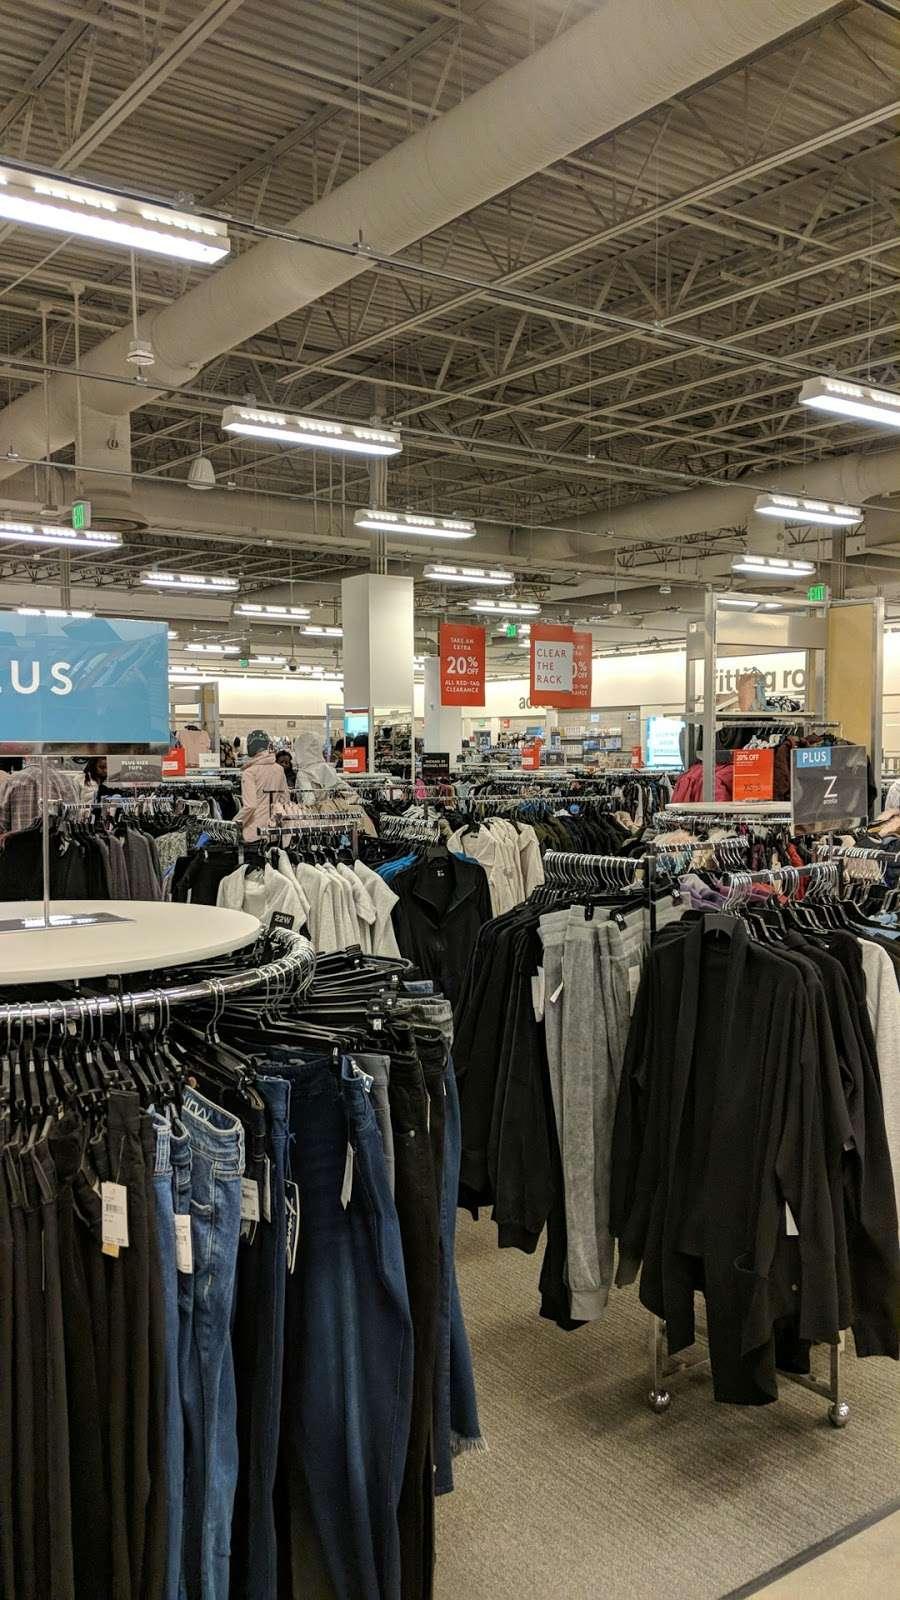 Nordstrom Rack Schererville - clothing store  | Photo 5 of 10 | Address: 185 US-41, Schererville, IN 46375, USA | Phone: (219) 227-3960